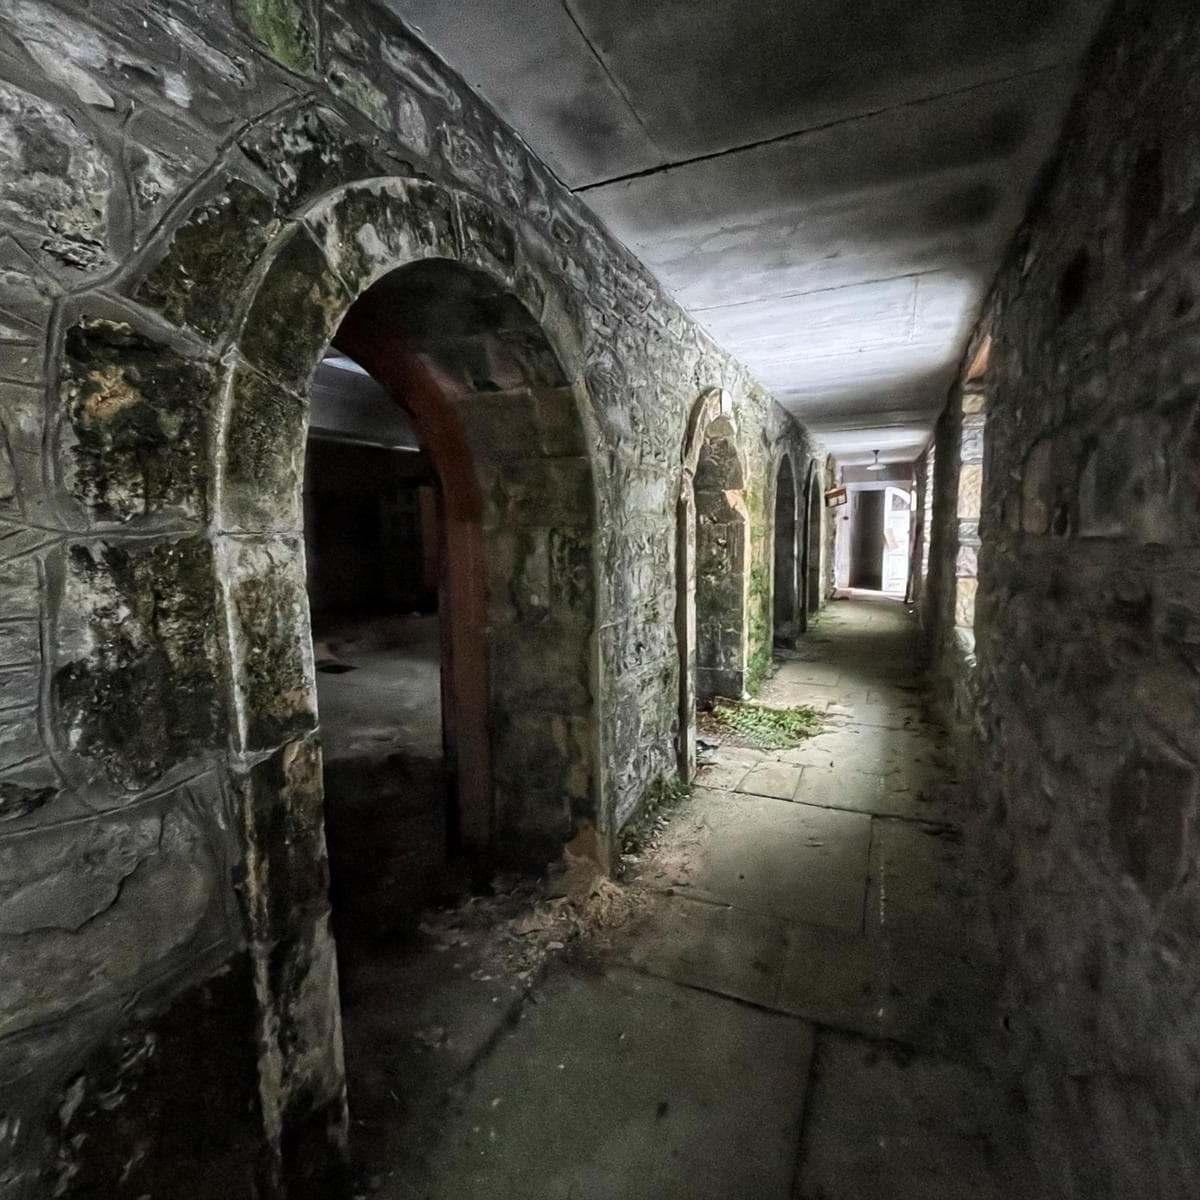 Coco Chanel Stone Hallway Mansion